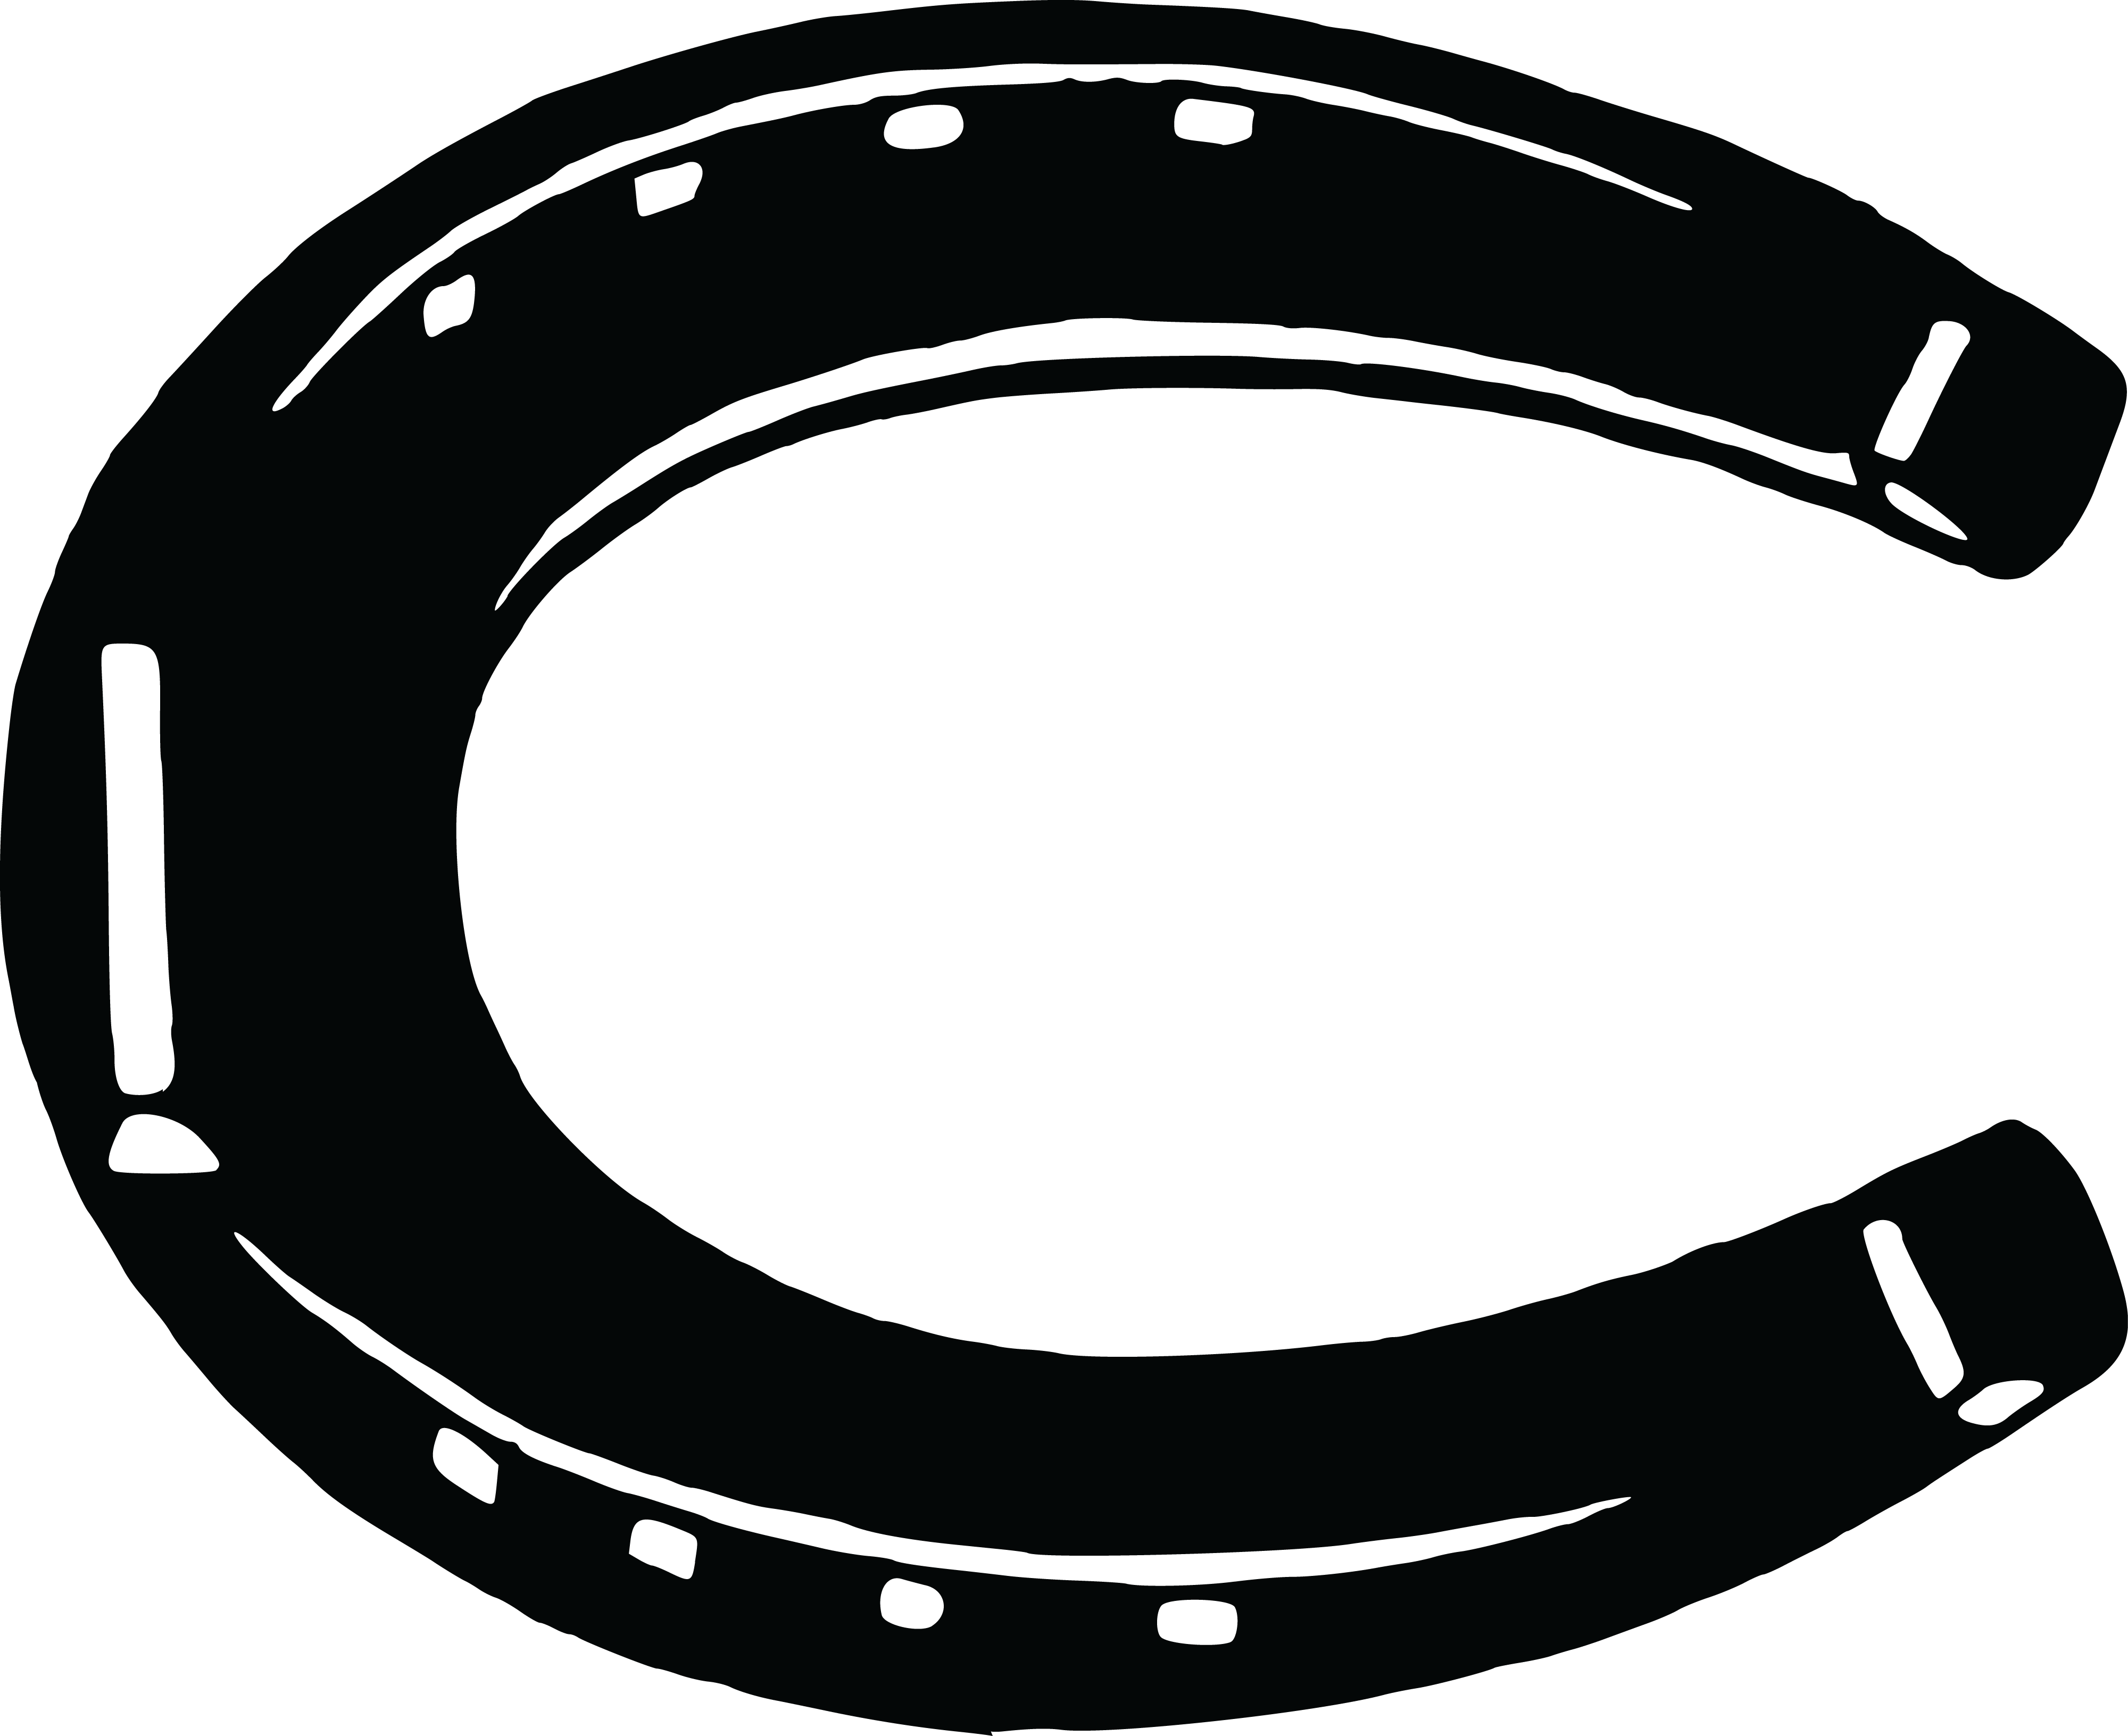 free clipart of a horseshoe rh free clipartof com horseshoe clip art vector free horseshoe clip art vector free